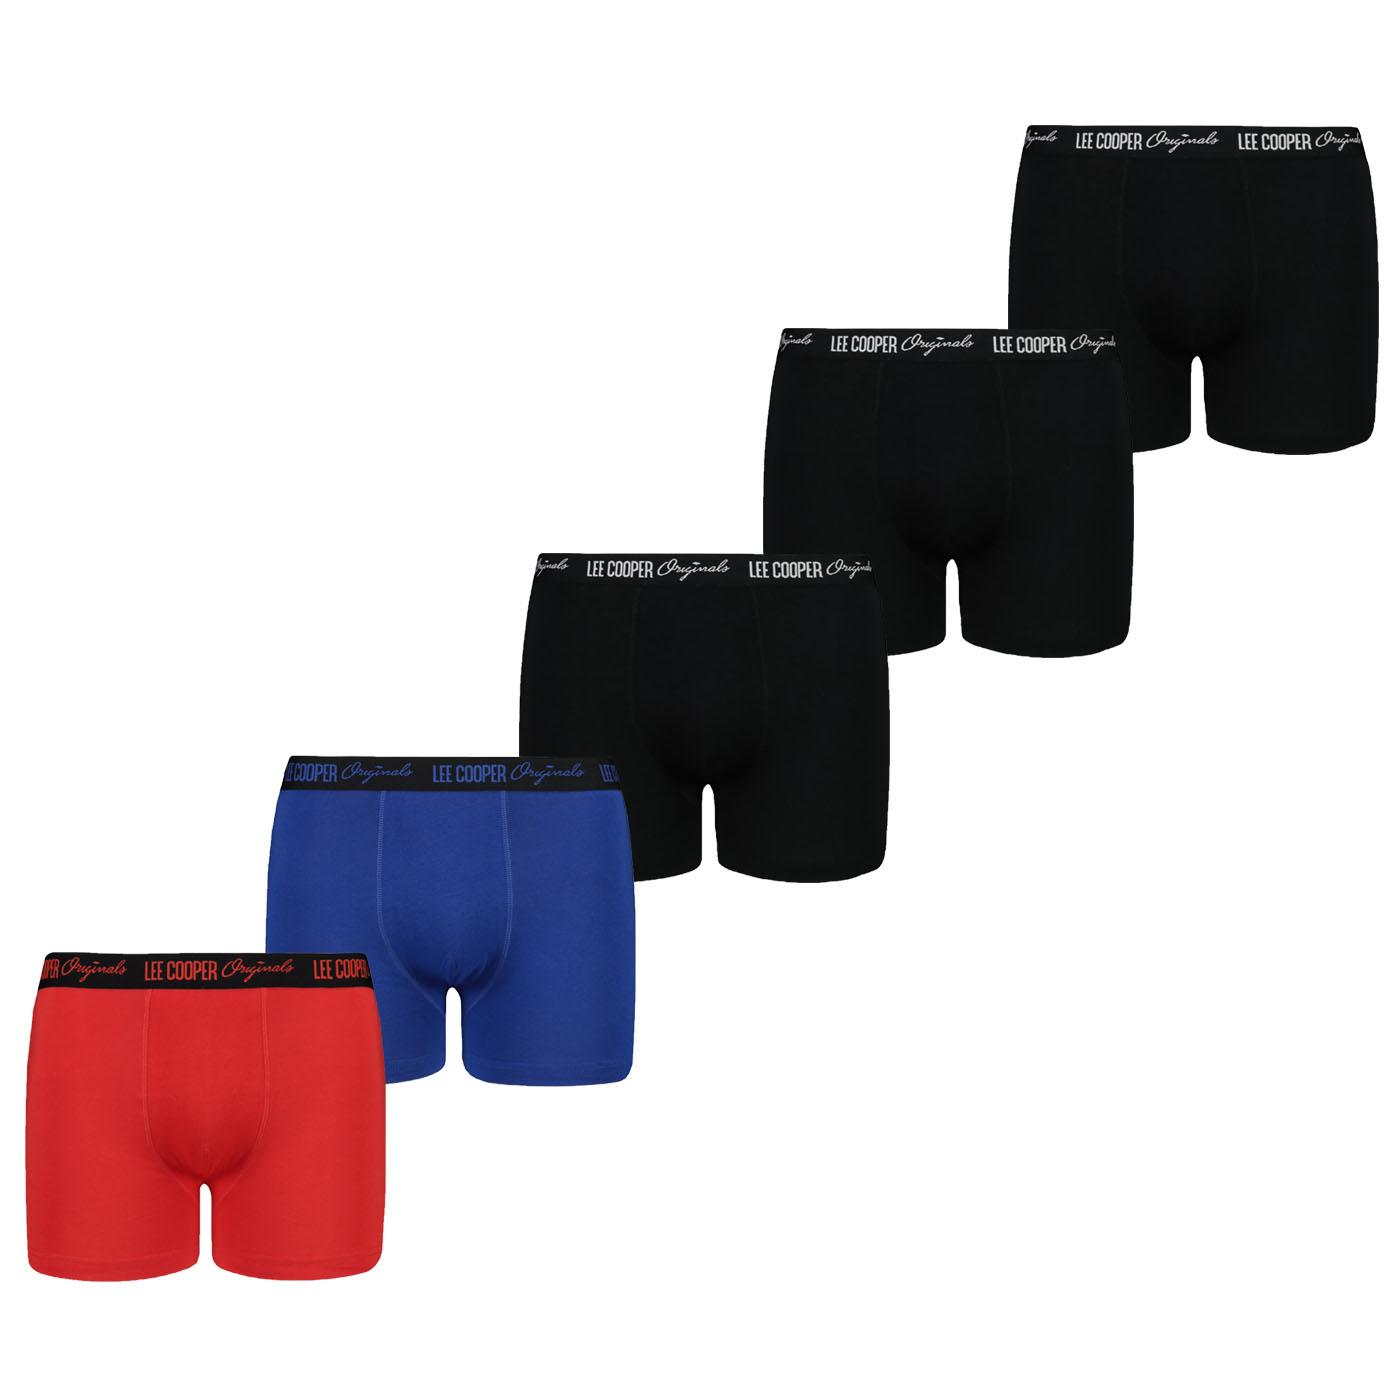 Pánske boxerky Lee Cooper Multicolored